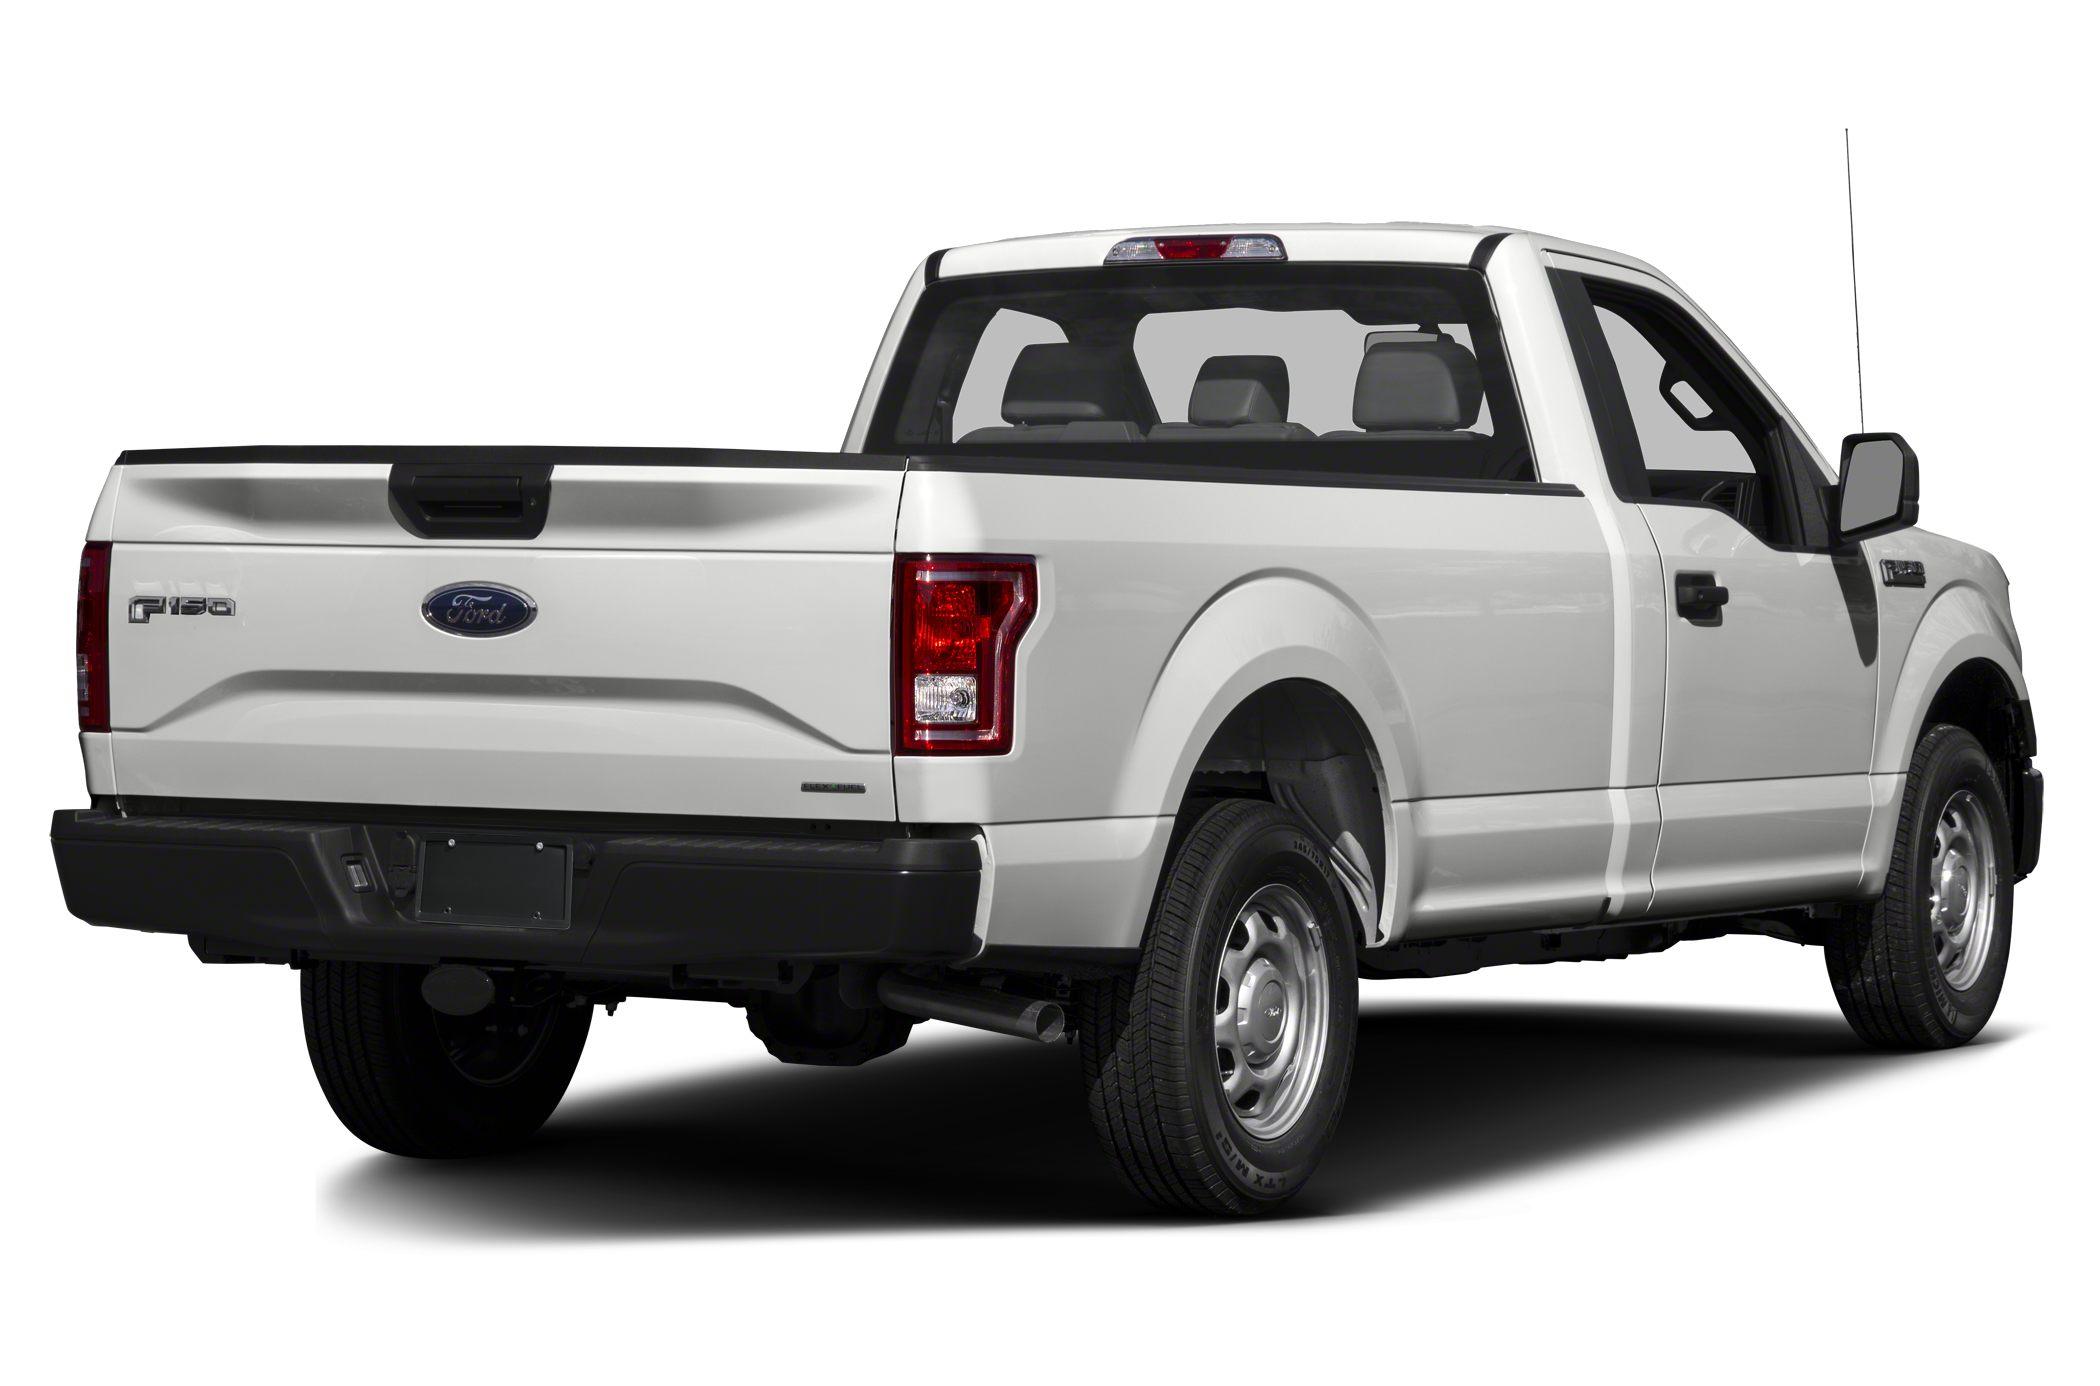 2015 Ford F 150 Regular Cab >> Comparison - Chevrolet Colorado Extended Cab Base 2015 ...